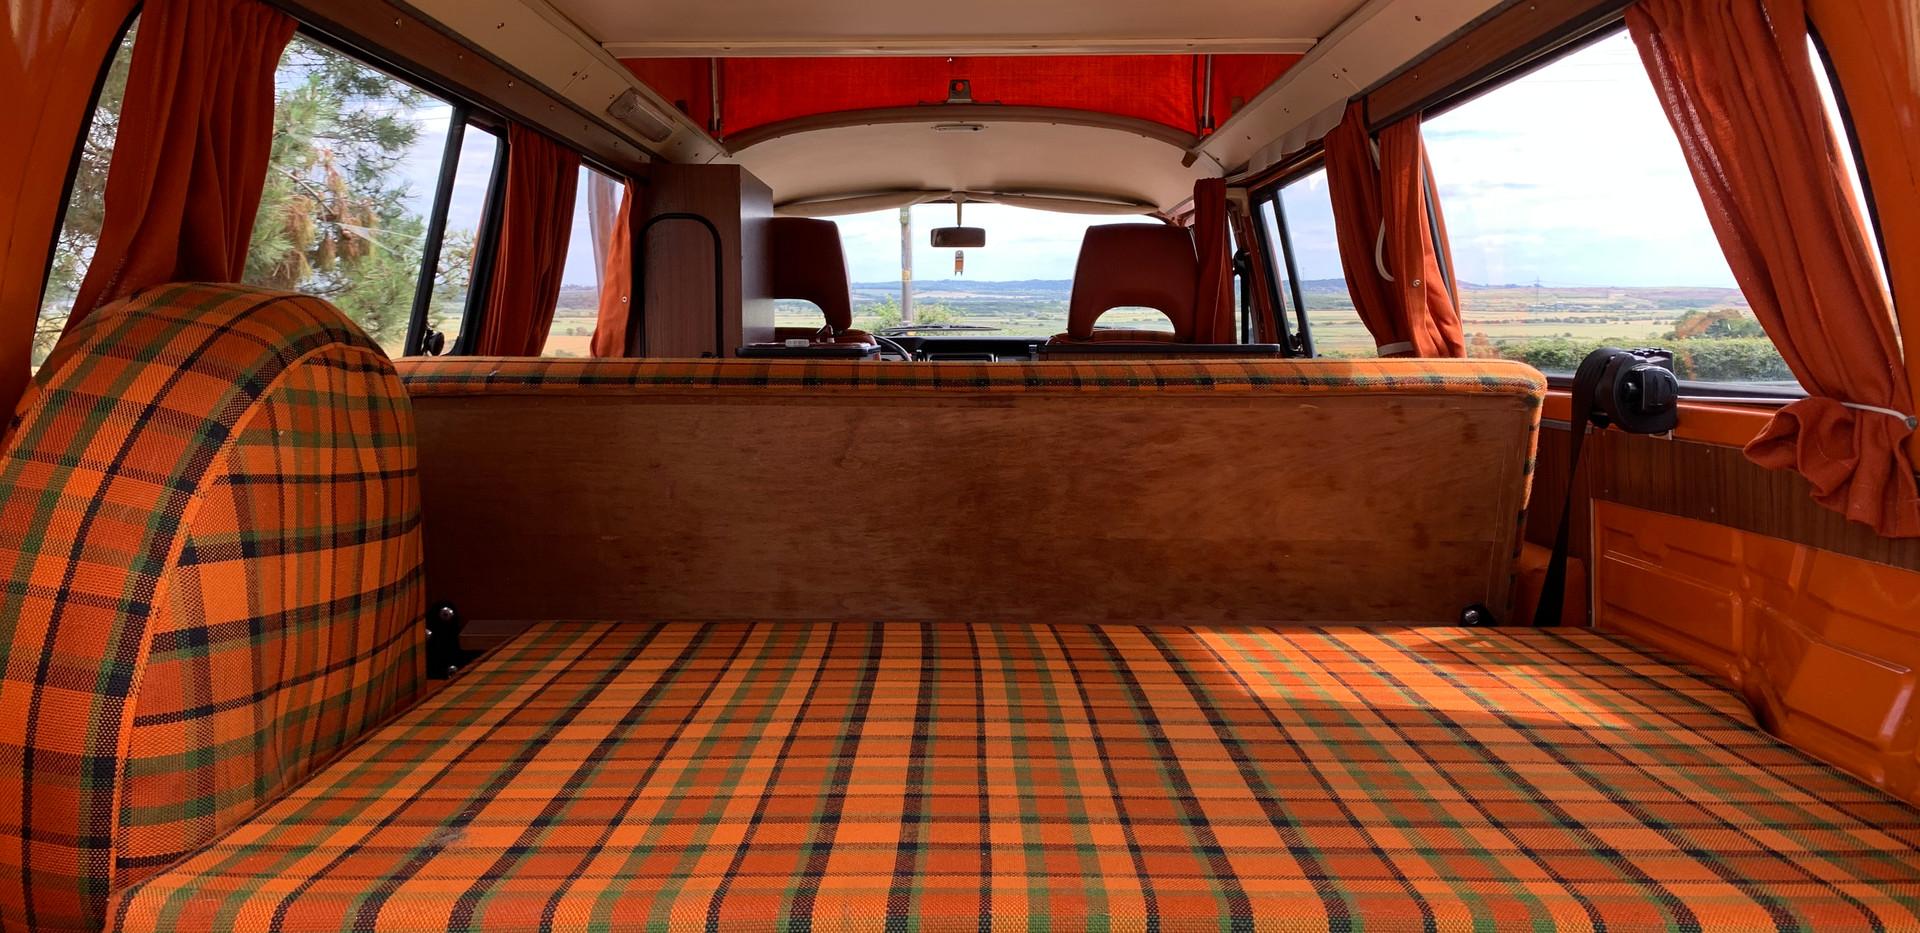 Campervan interiors .jpg